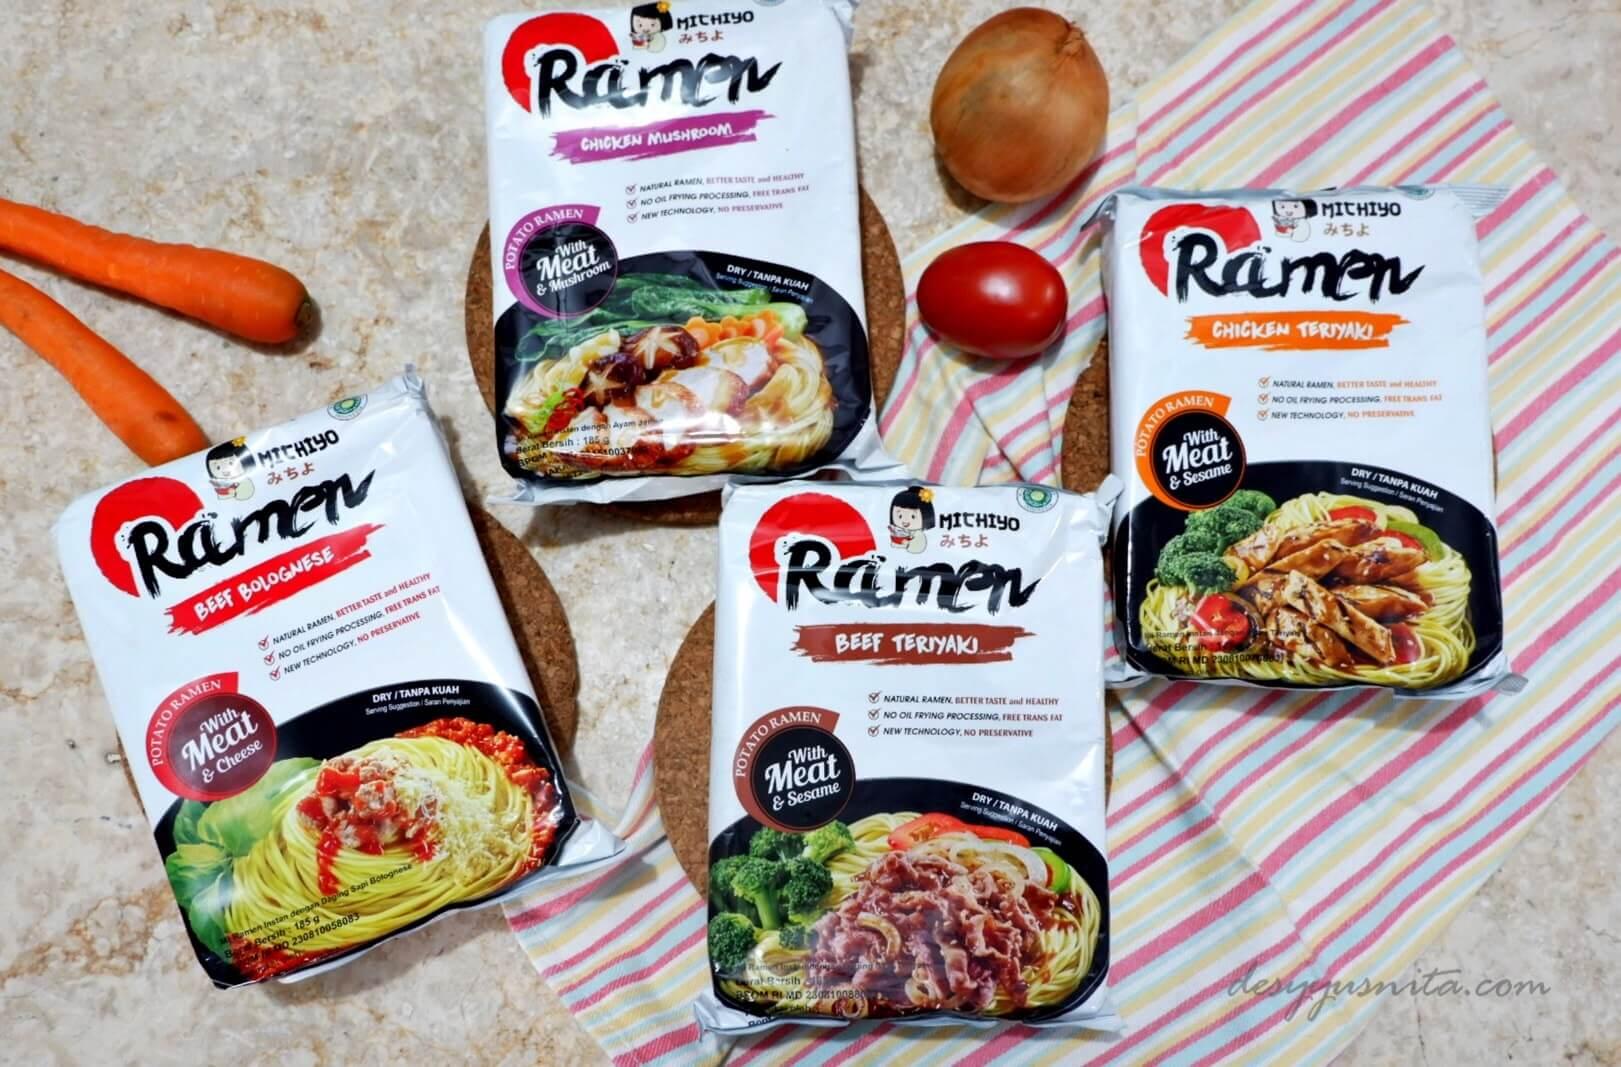 Review, Michiyo Ramen, Ramen Sehat, Ramen Tak Berkuah, Ramen Jepang, Kuliner, Makanan,